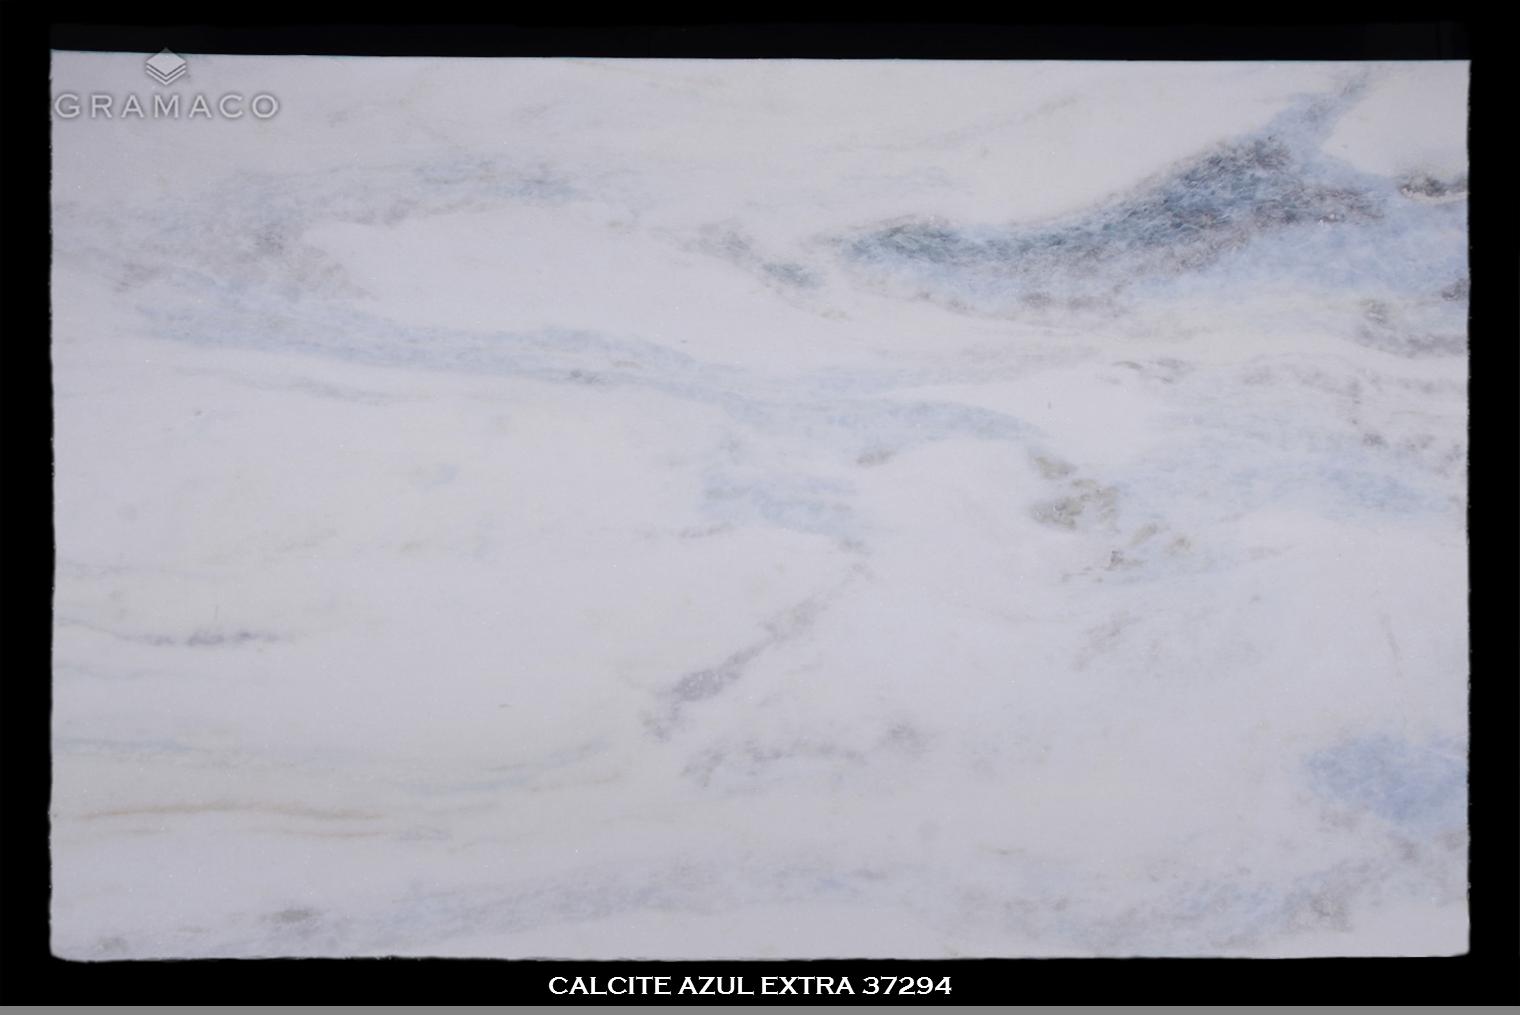 CALCITEAZULEXTRA37294